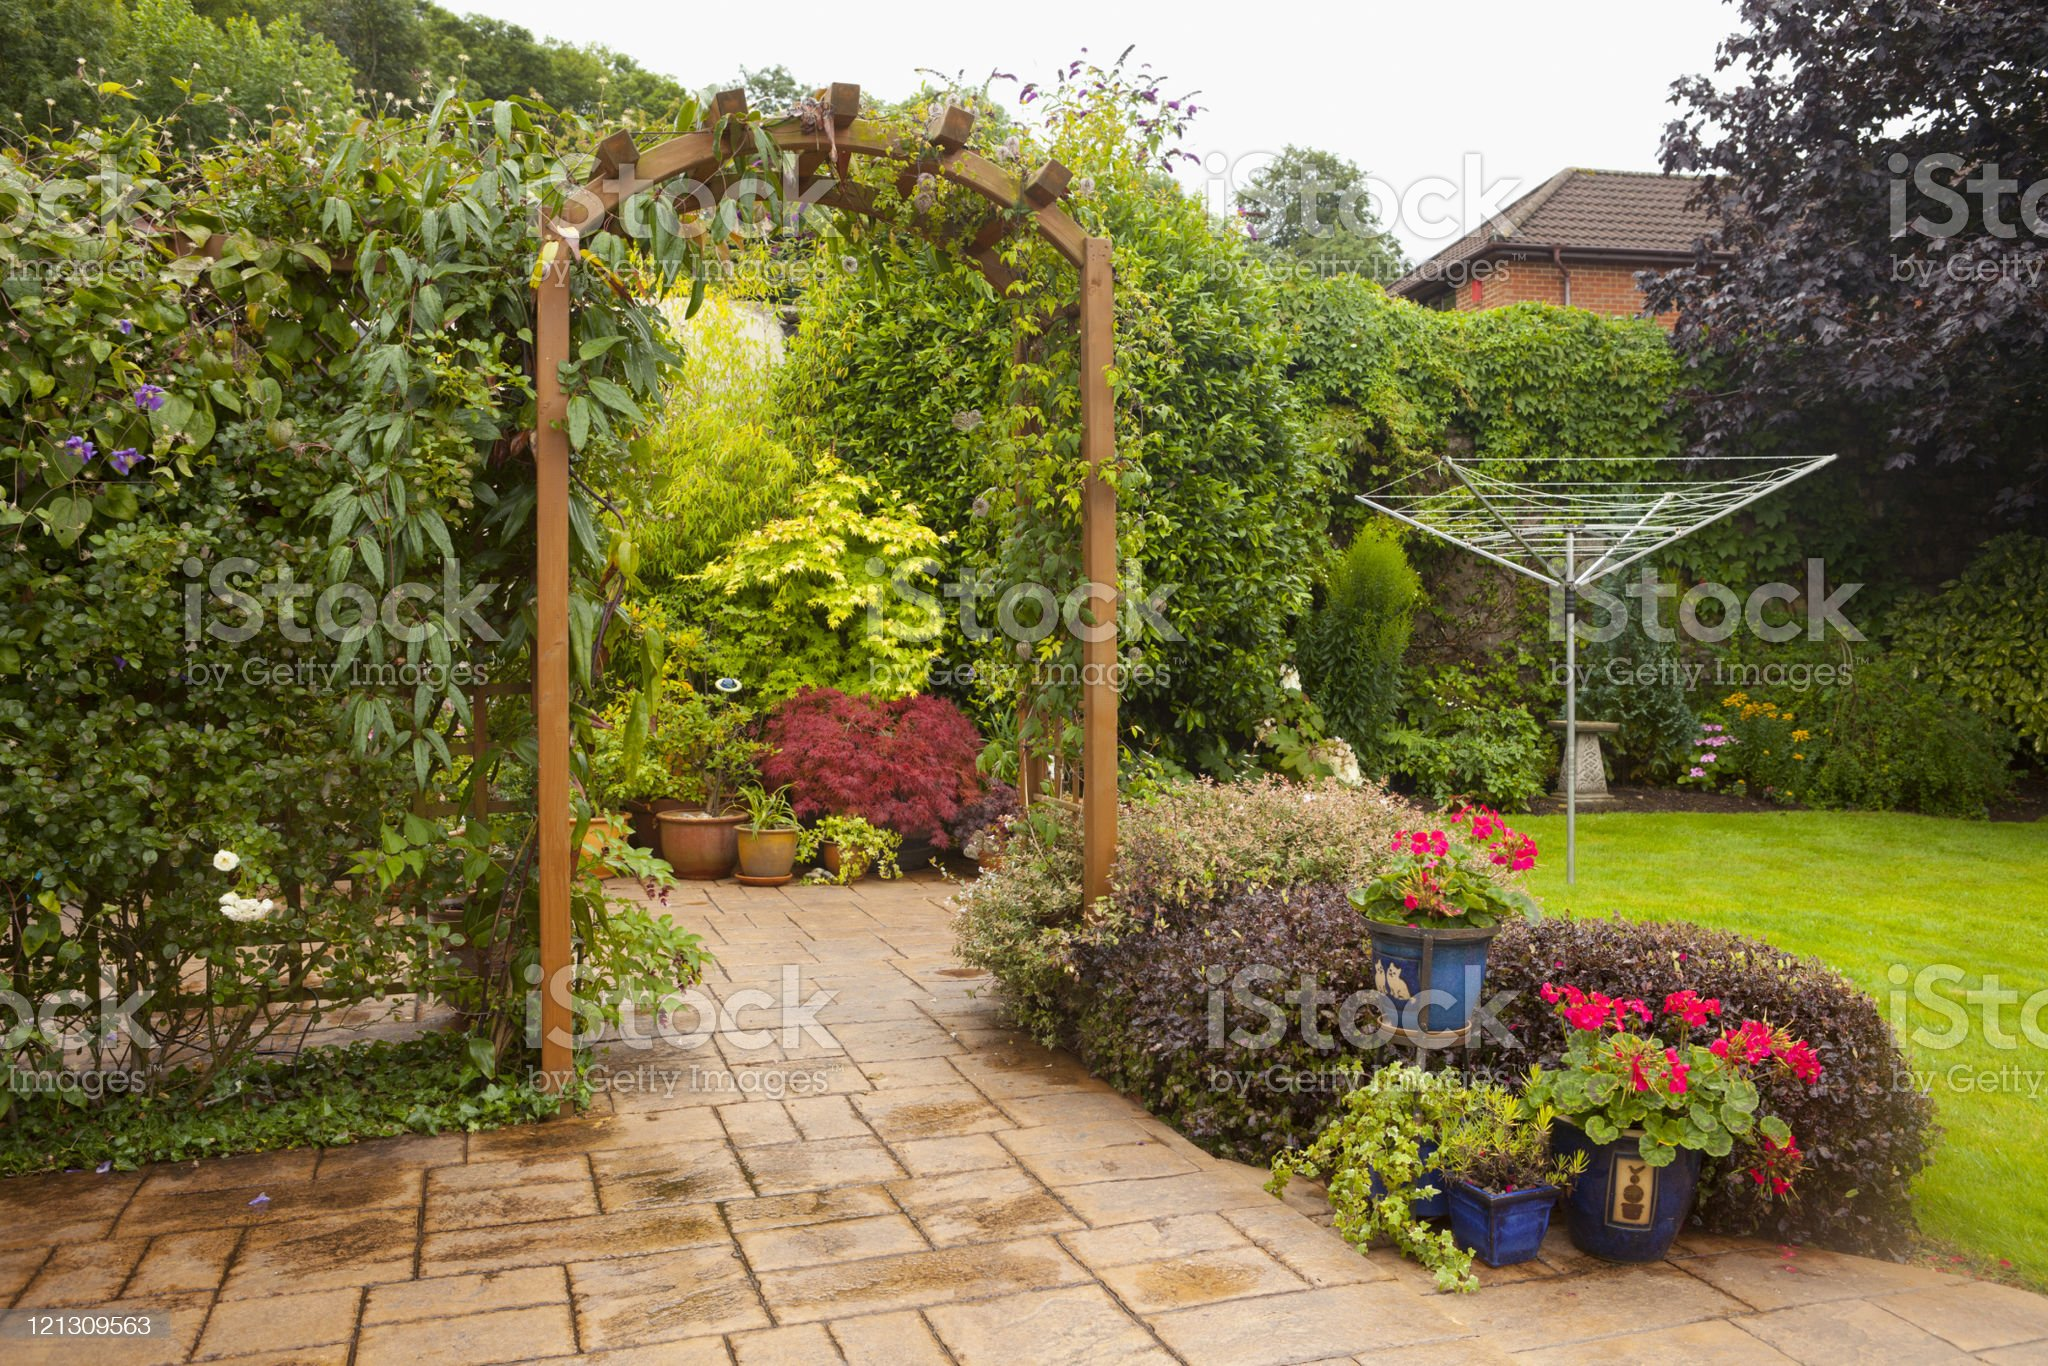 English Domestic Garden royalty-free stock photo